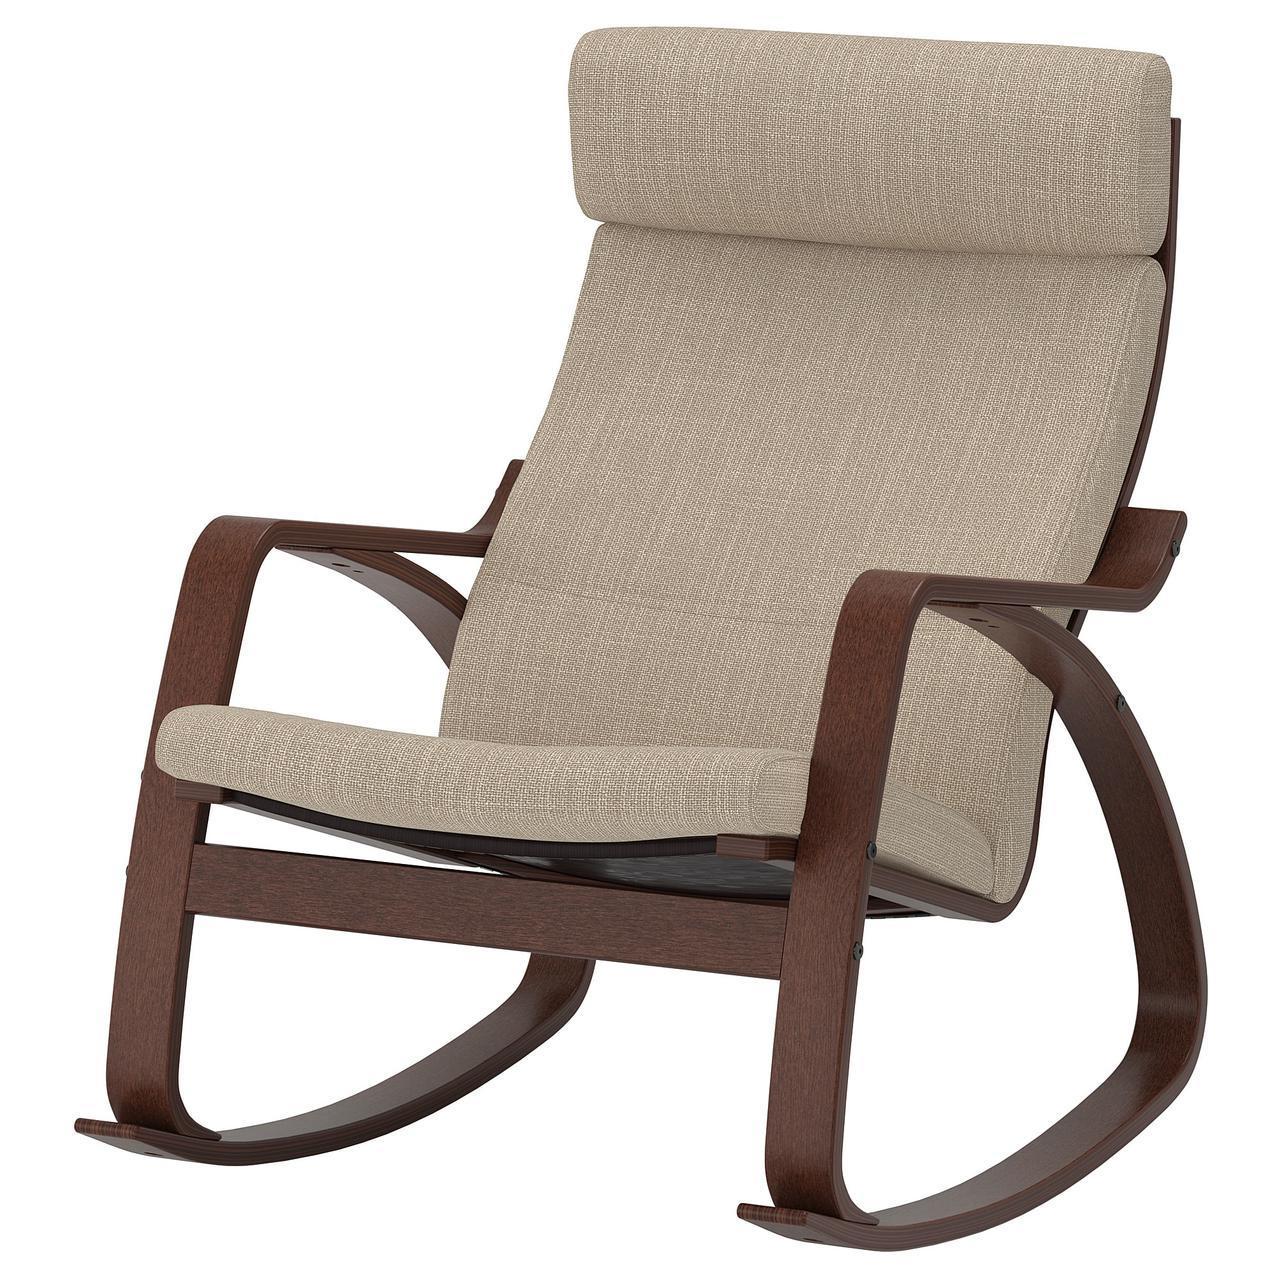 IKEA POANG (291.502.11) Качающийся стул, коричневый,